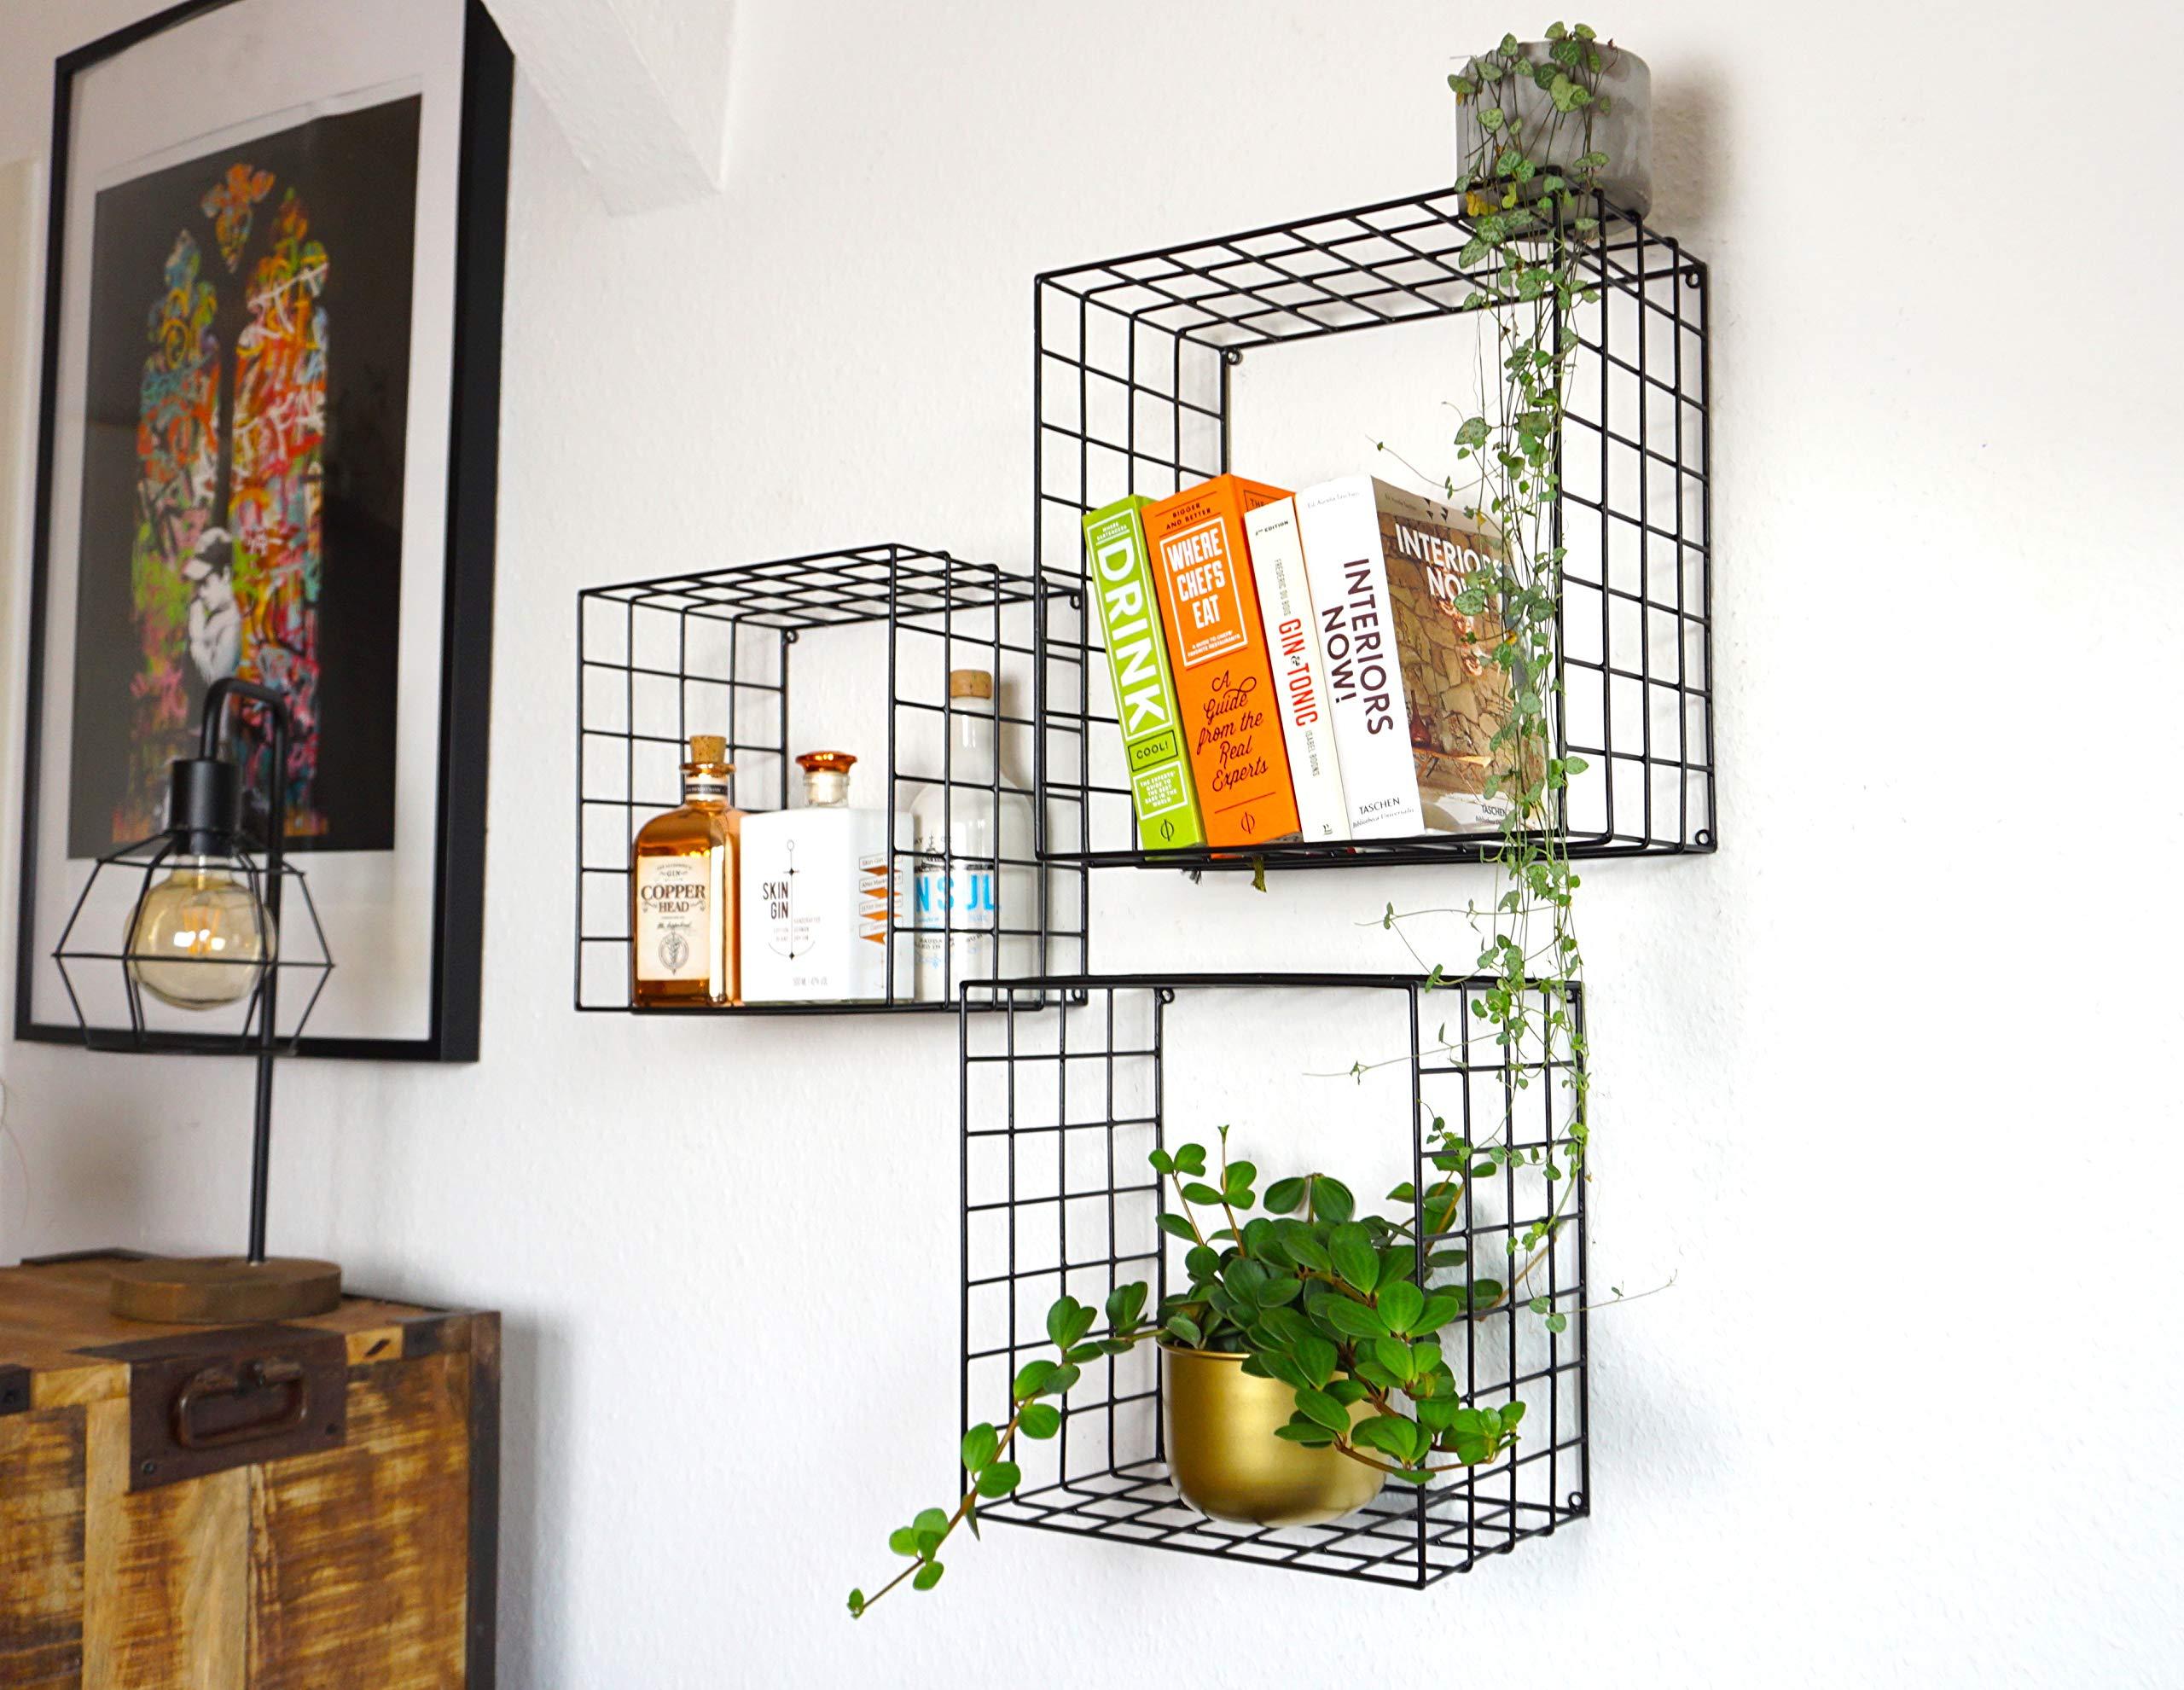 Kimisty Mesh Floating Shelves (Square) -  - wall-shelves, living-room-furniture, living-room - 81b iKCFvBL -